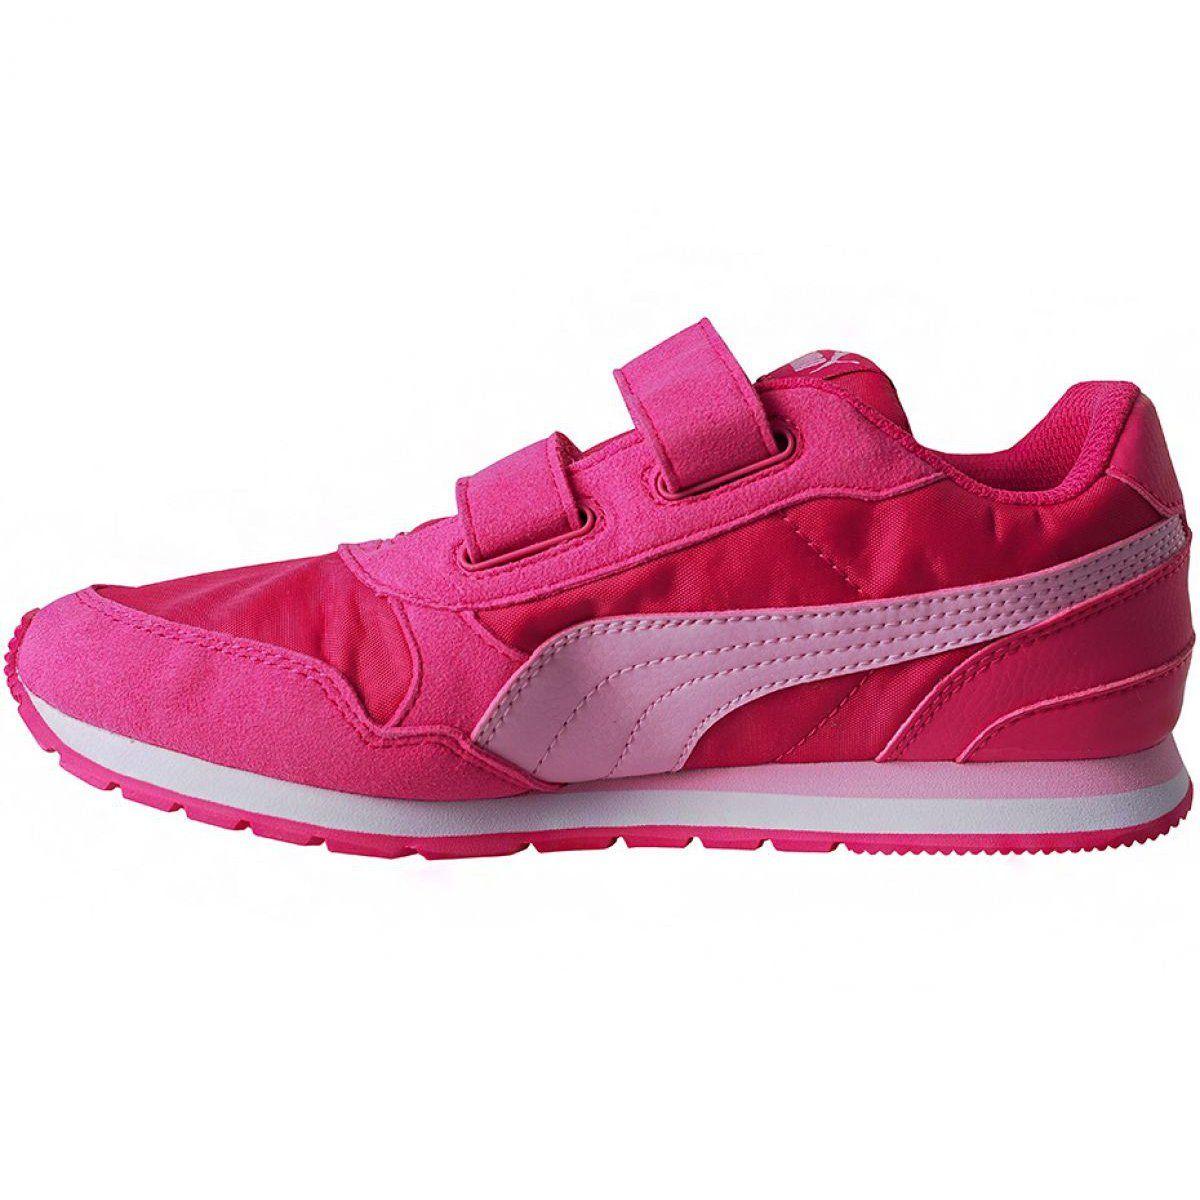 Buty Puma St Runner V2 Nl V Ps Jr 365294 12 Rozowe Childrens Shoes Kid Shoes Shoes